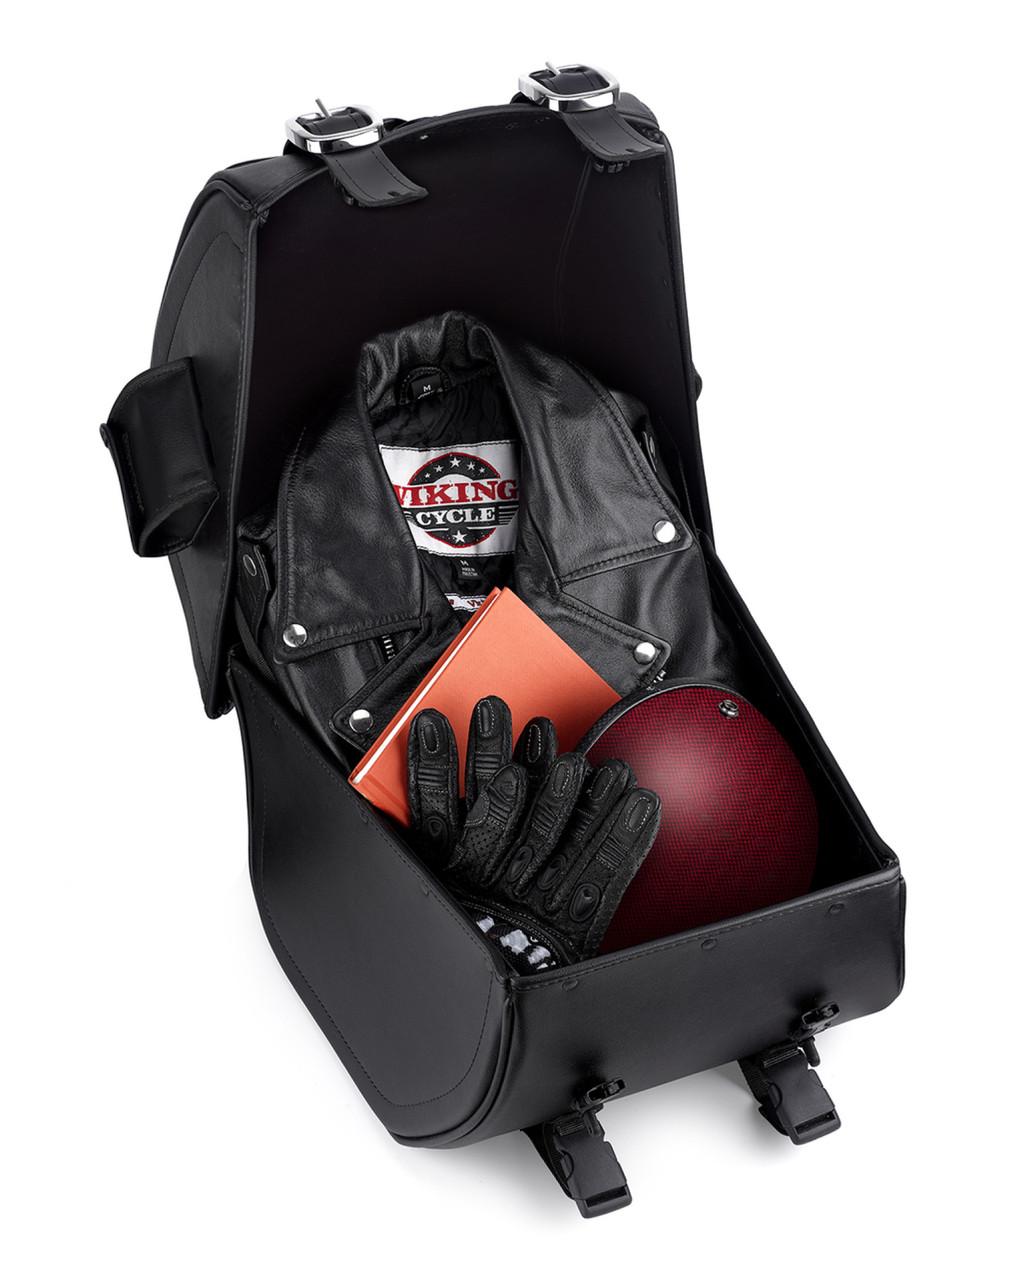 Suzuki Viking Classic Motorcycle Tail Bag Storage View